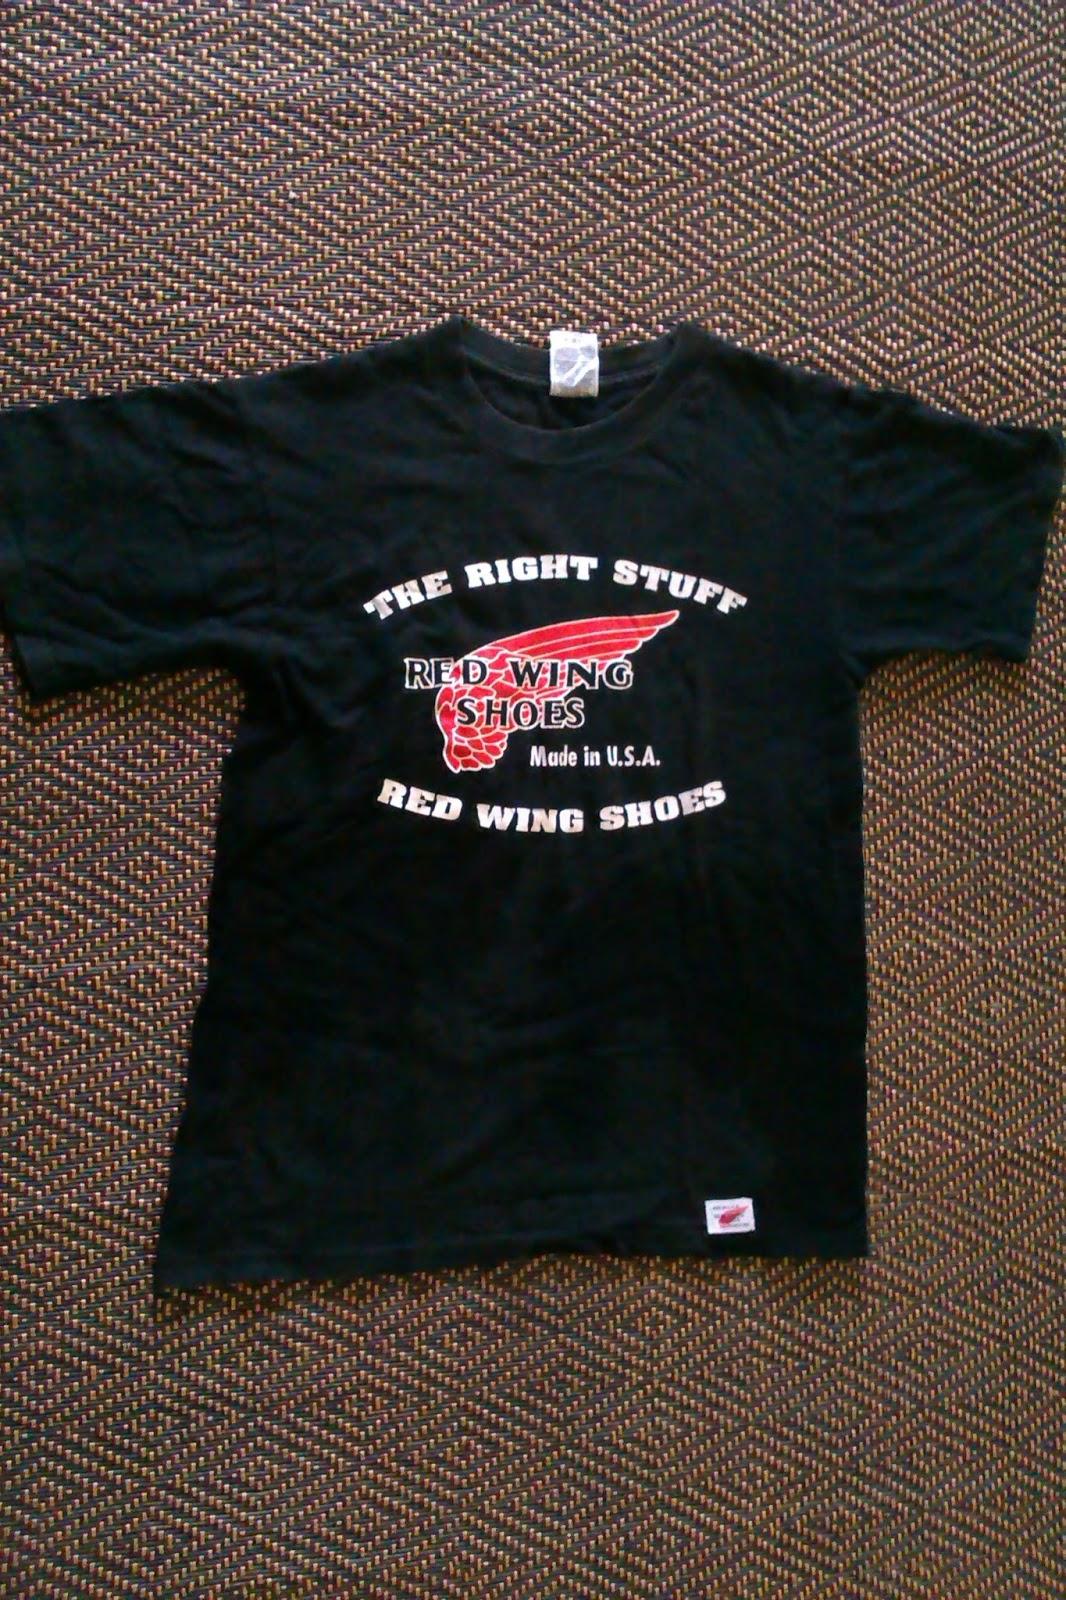 Bintang Bunder Red Wing Shoes Made In Usa Tee Shirt Black